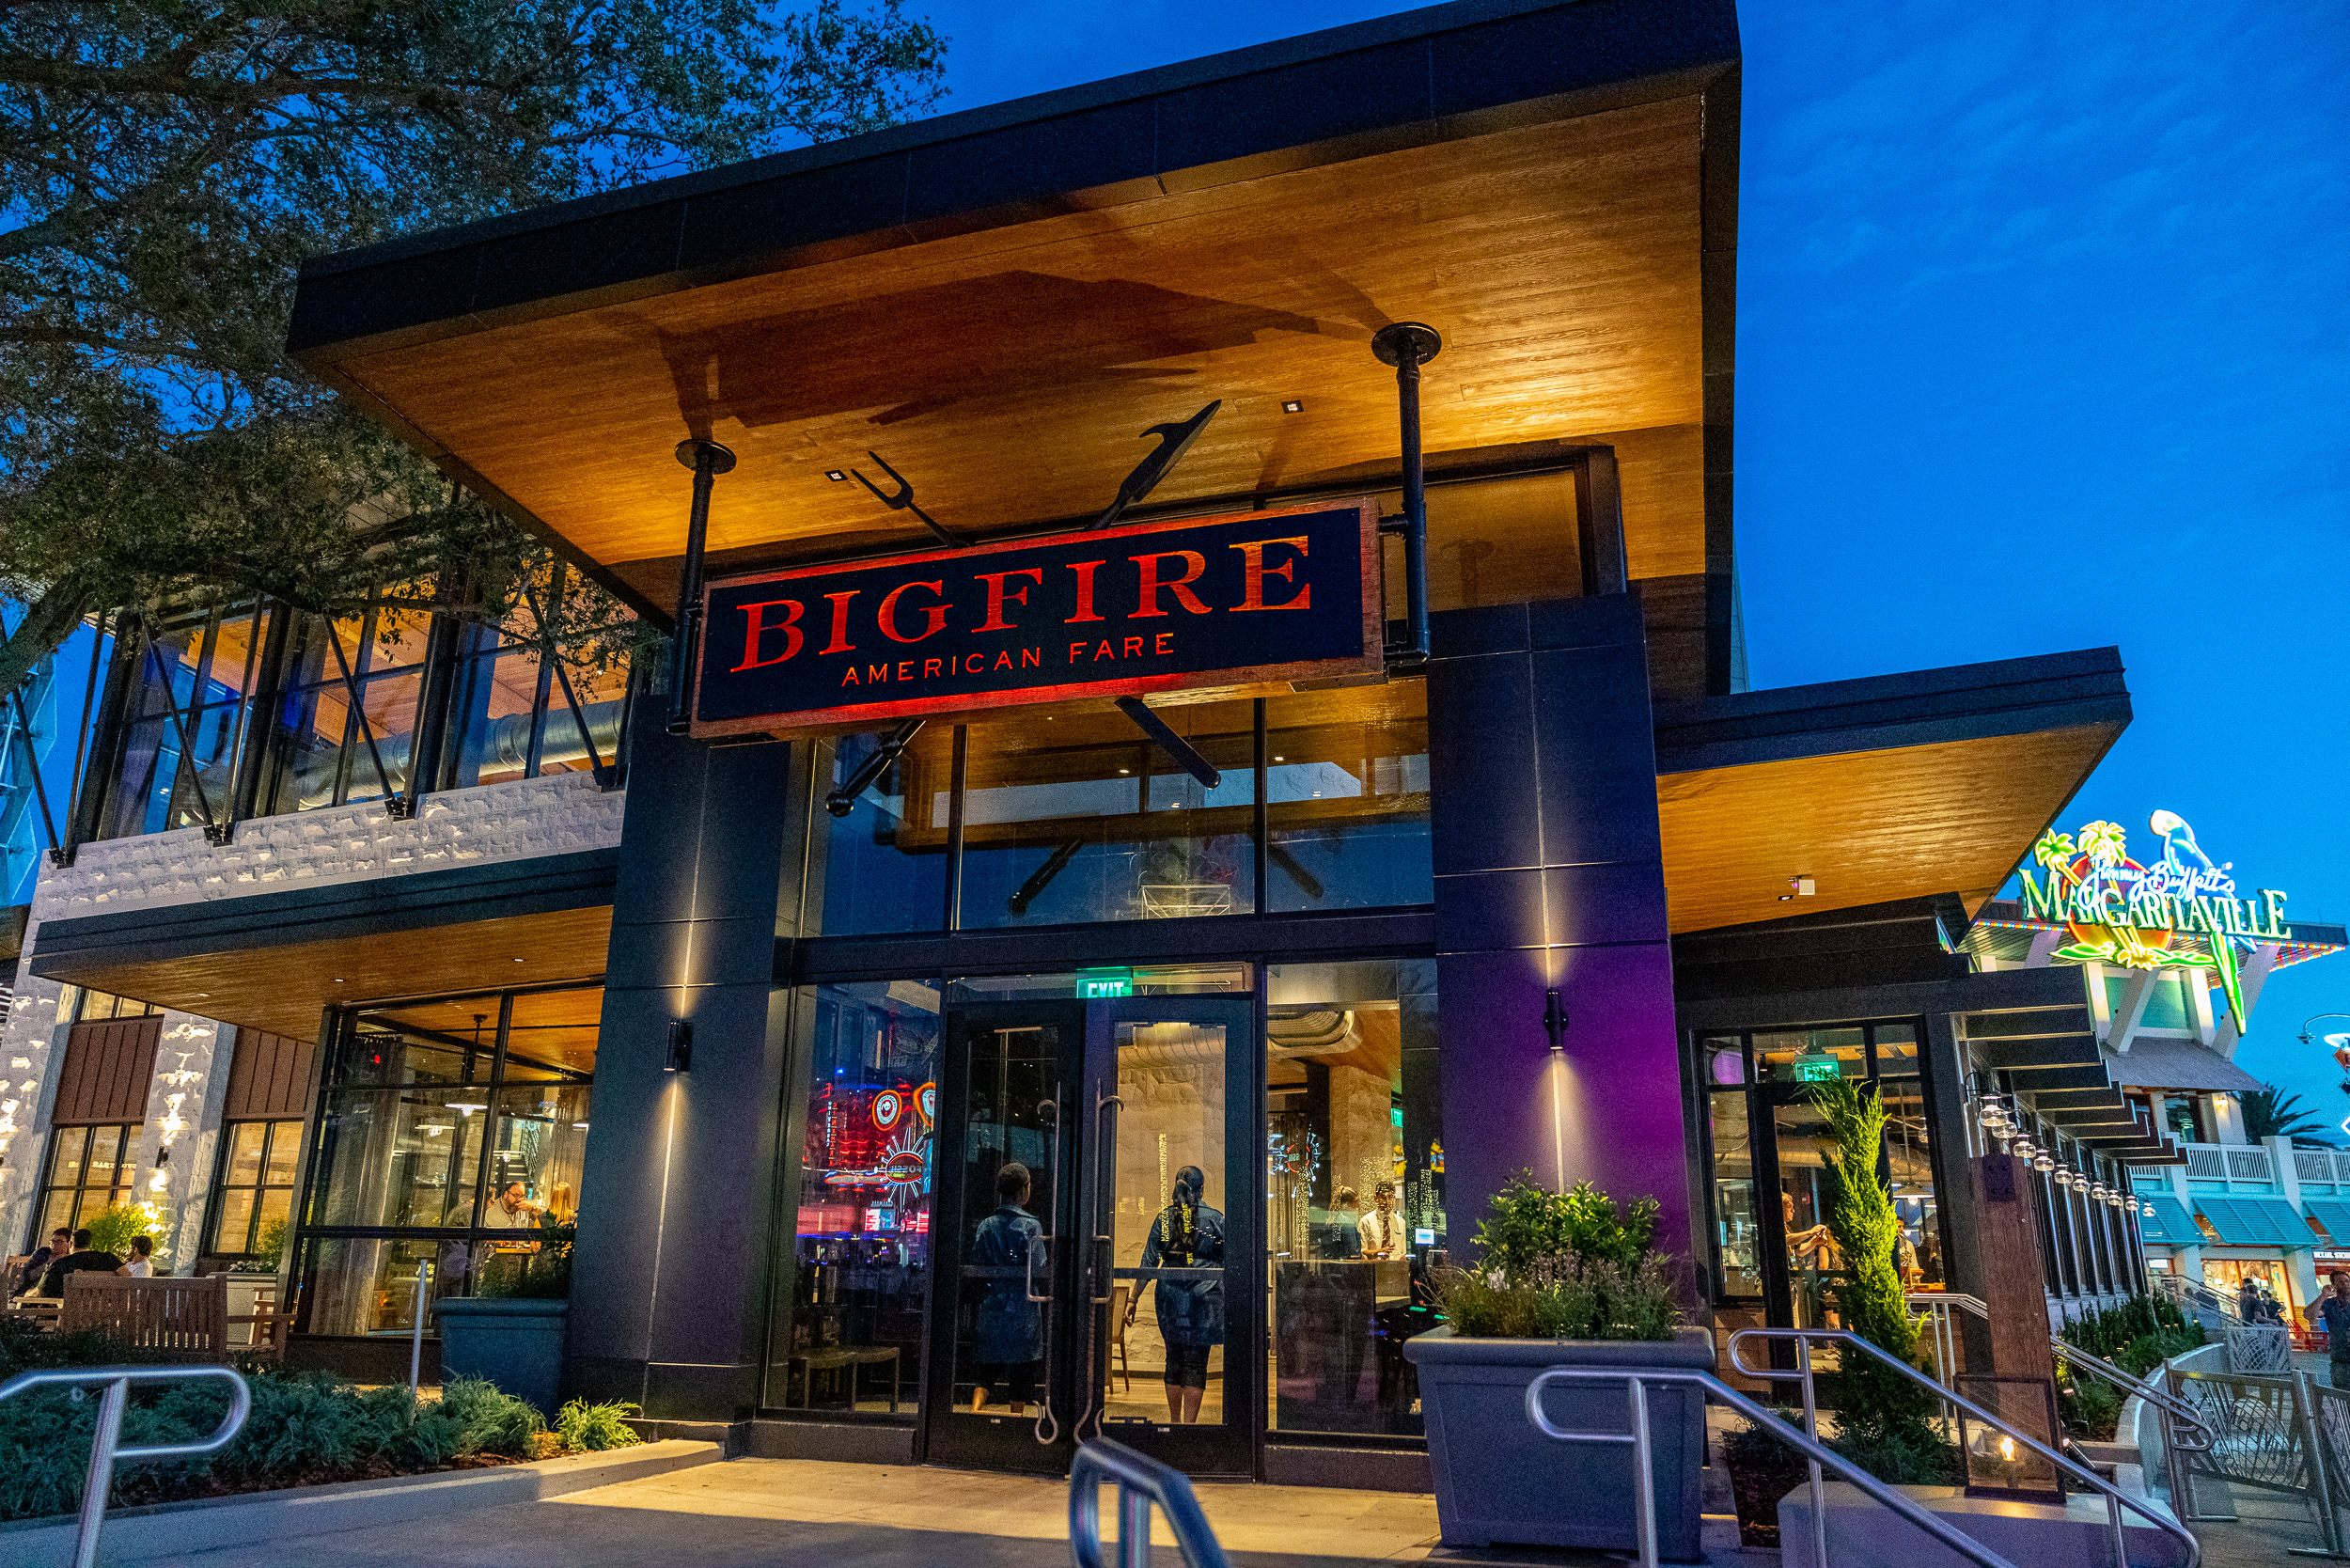 Bigfire: 3 big takeaways from Universal Orlando's newest restaurant